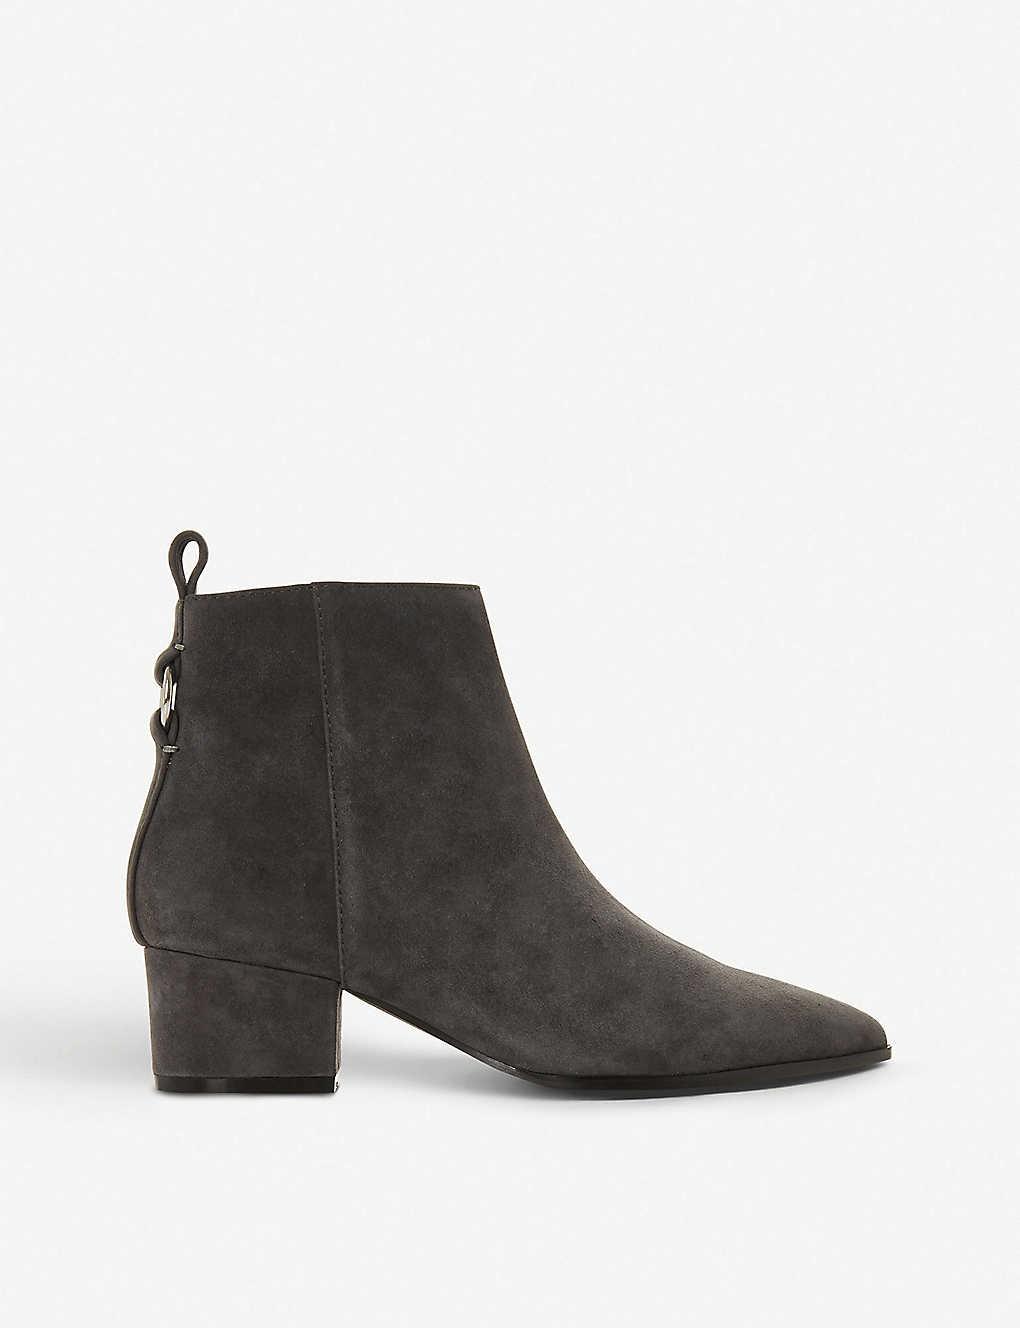 623a291cd14 STEVE MADDEN - Clover ring-detail suede ankle boots | Selfridges.com